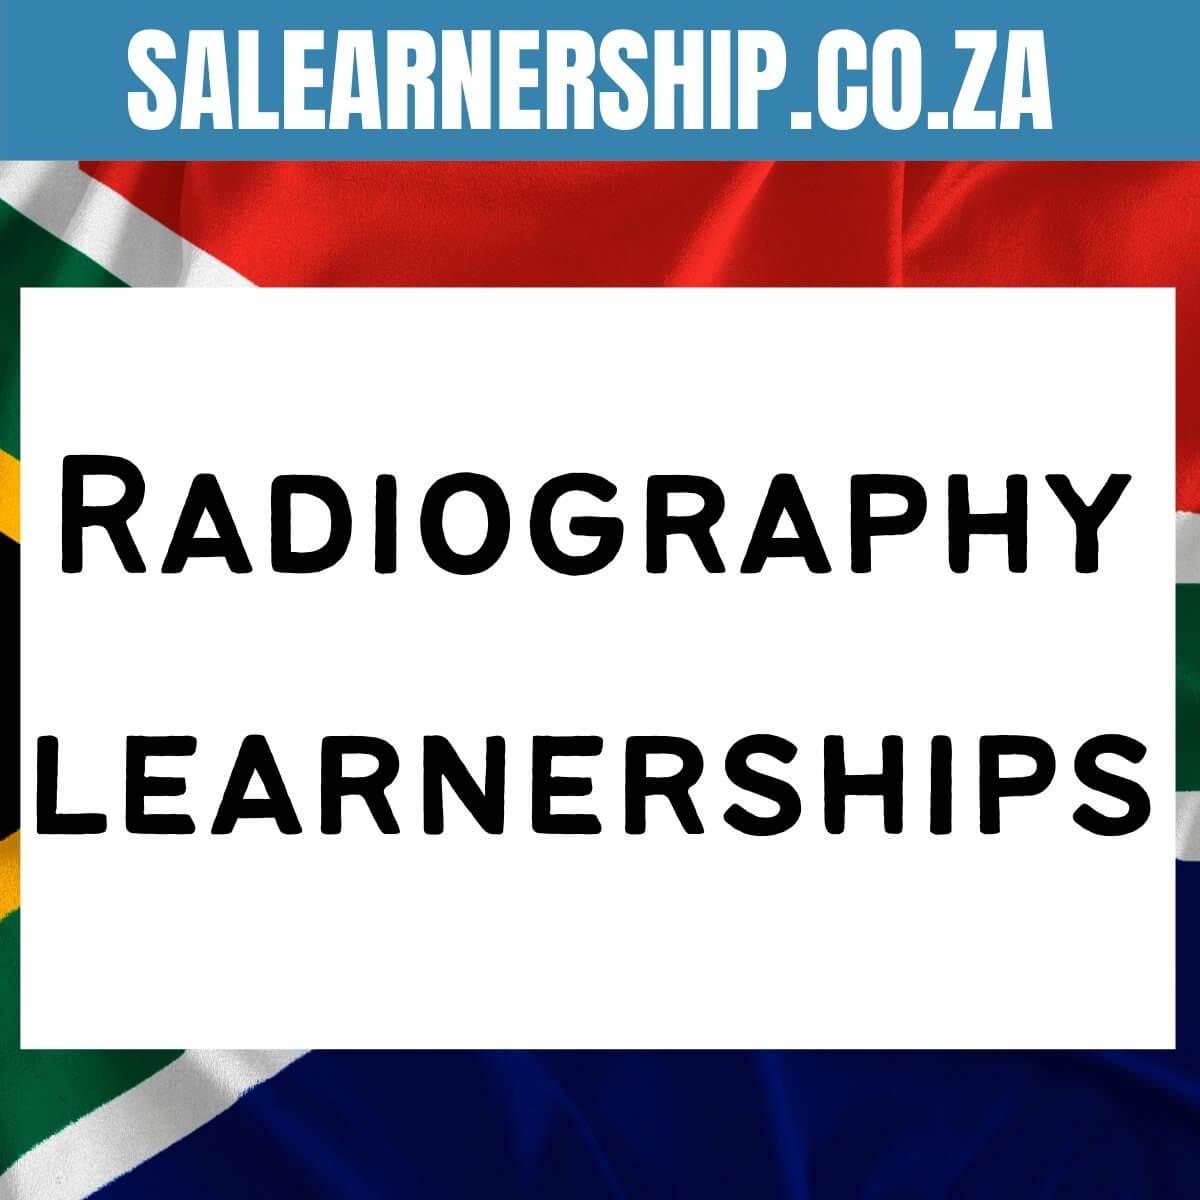 Radiography learnerships